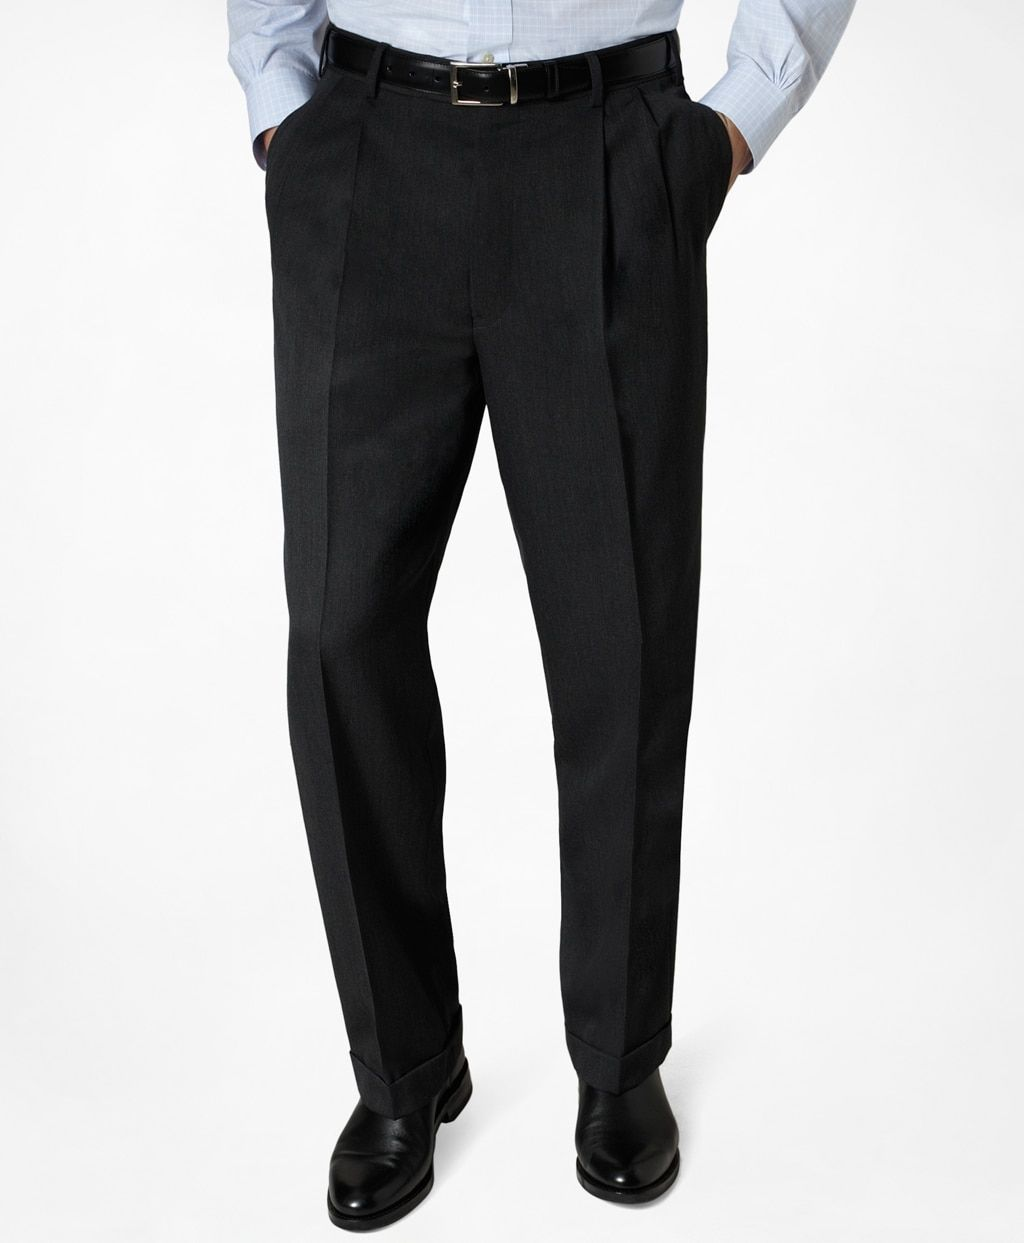 Men S Regular Fit Pleat Front Classic Gabardine Pants Brooks Brothers In 2021 Black Dress Pants Men Black Slacks Men Black Pants Men [ 1243 x 1024 Pixel ]